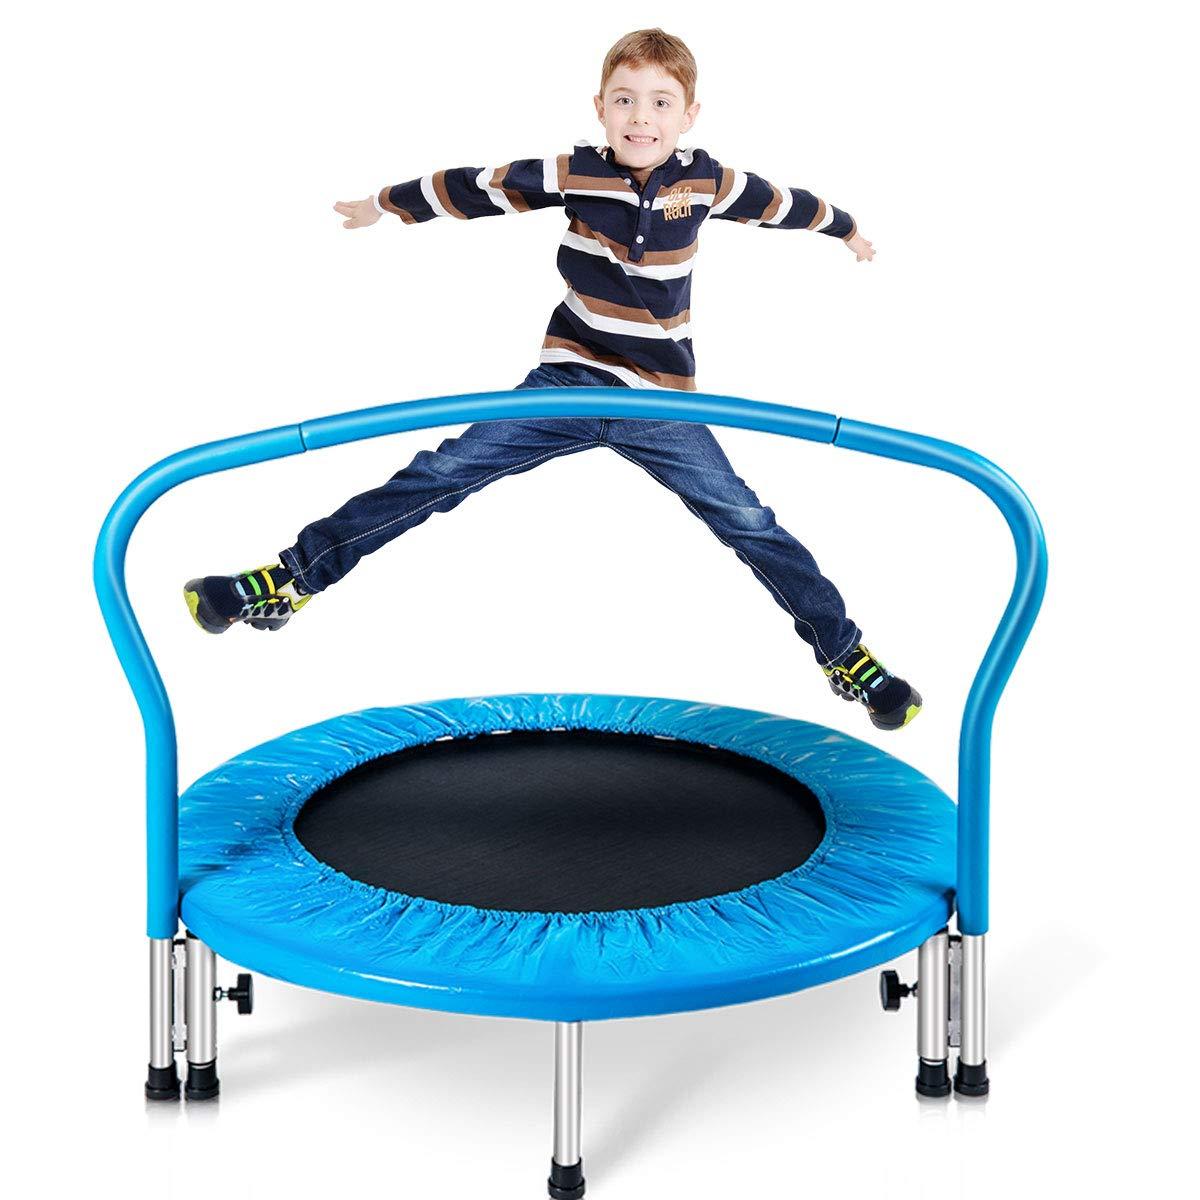 Merax 36'' Kid's Mini Exercise Trampoline Portable Trampoline Toddler Trampoline with Handrail (Blue Pad)